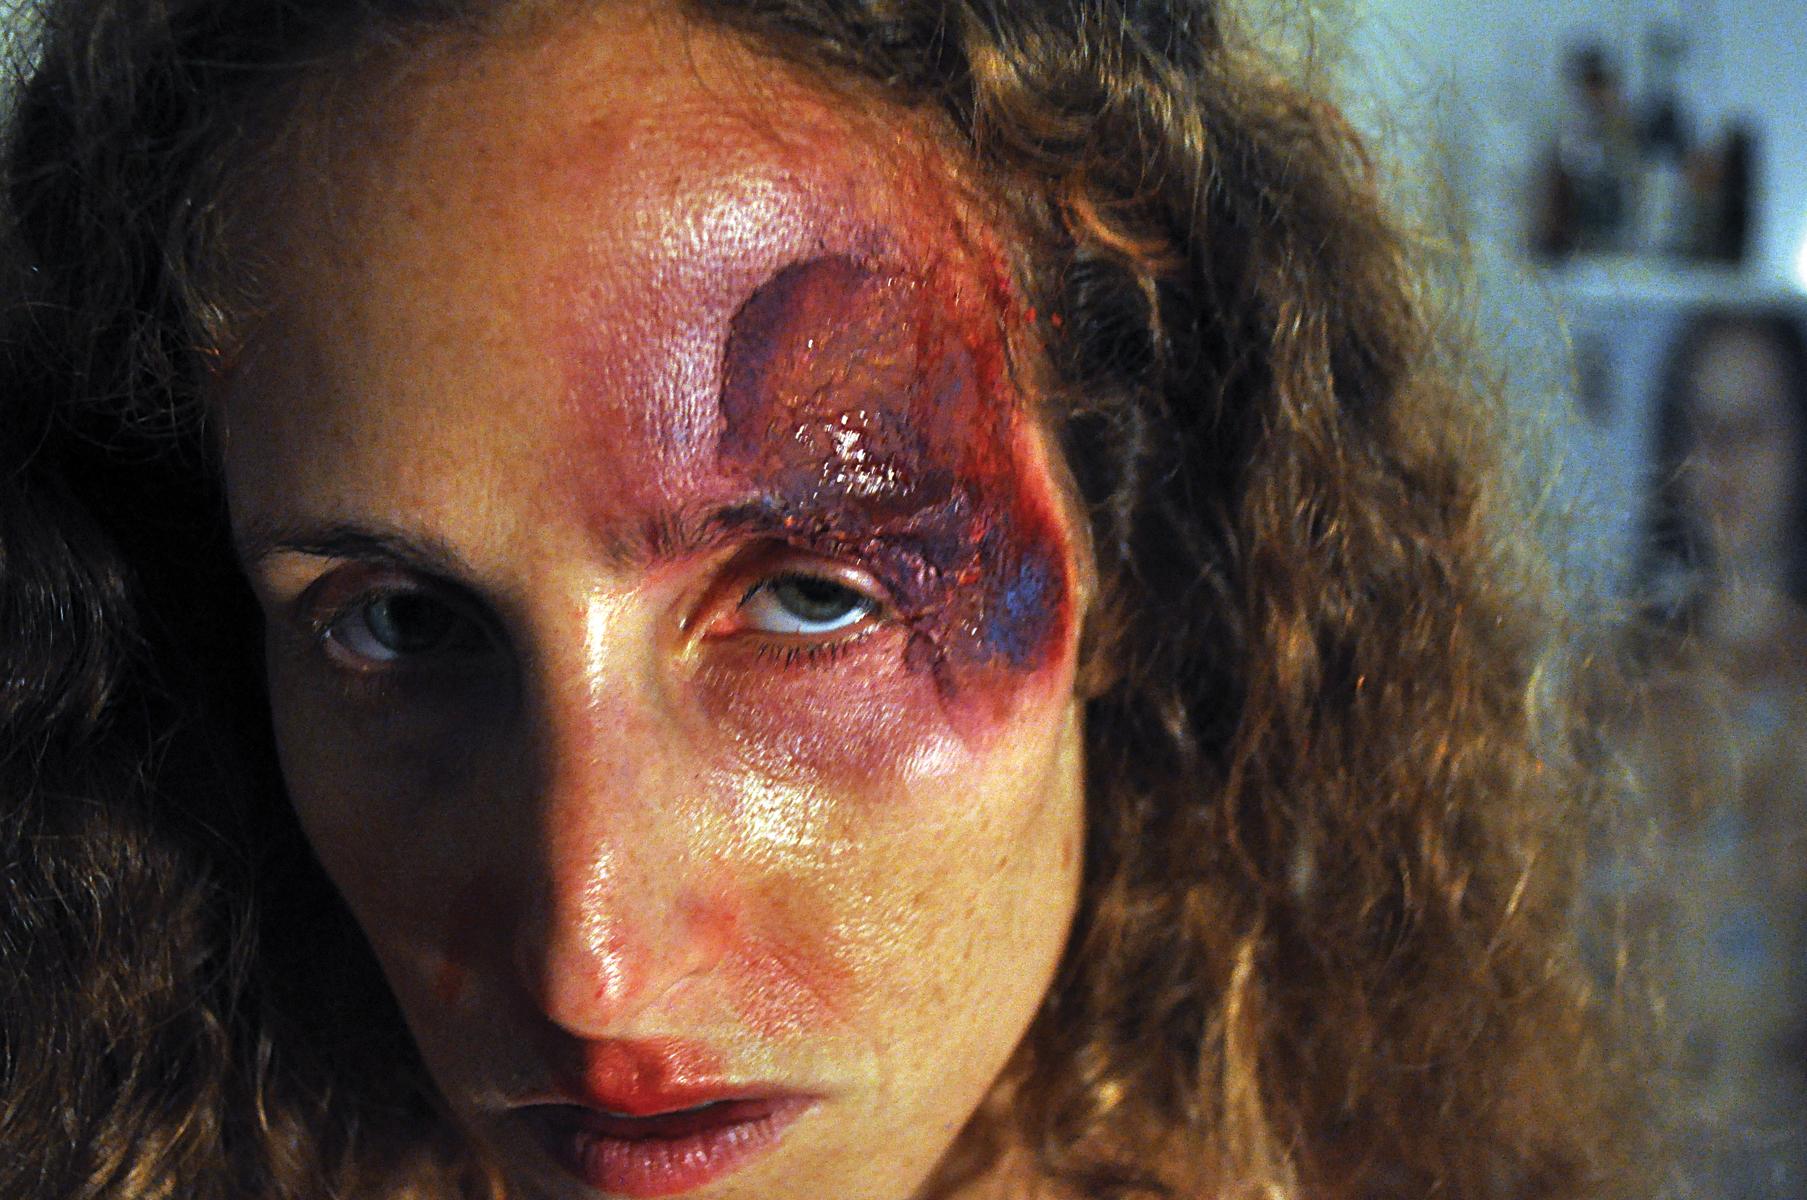 Self Portrait as a Simulacra (2009)